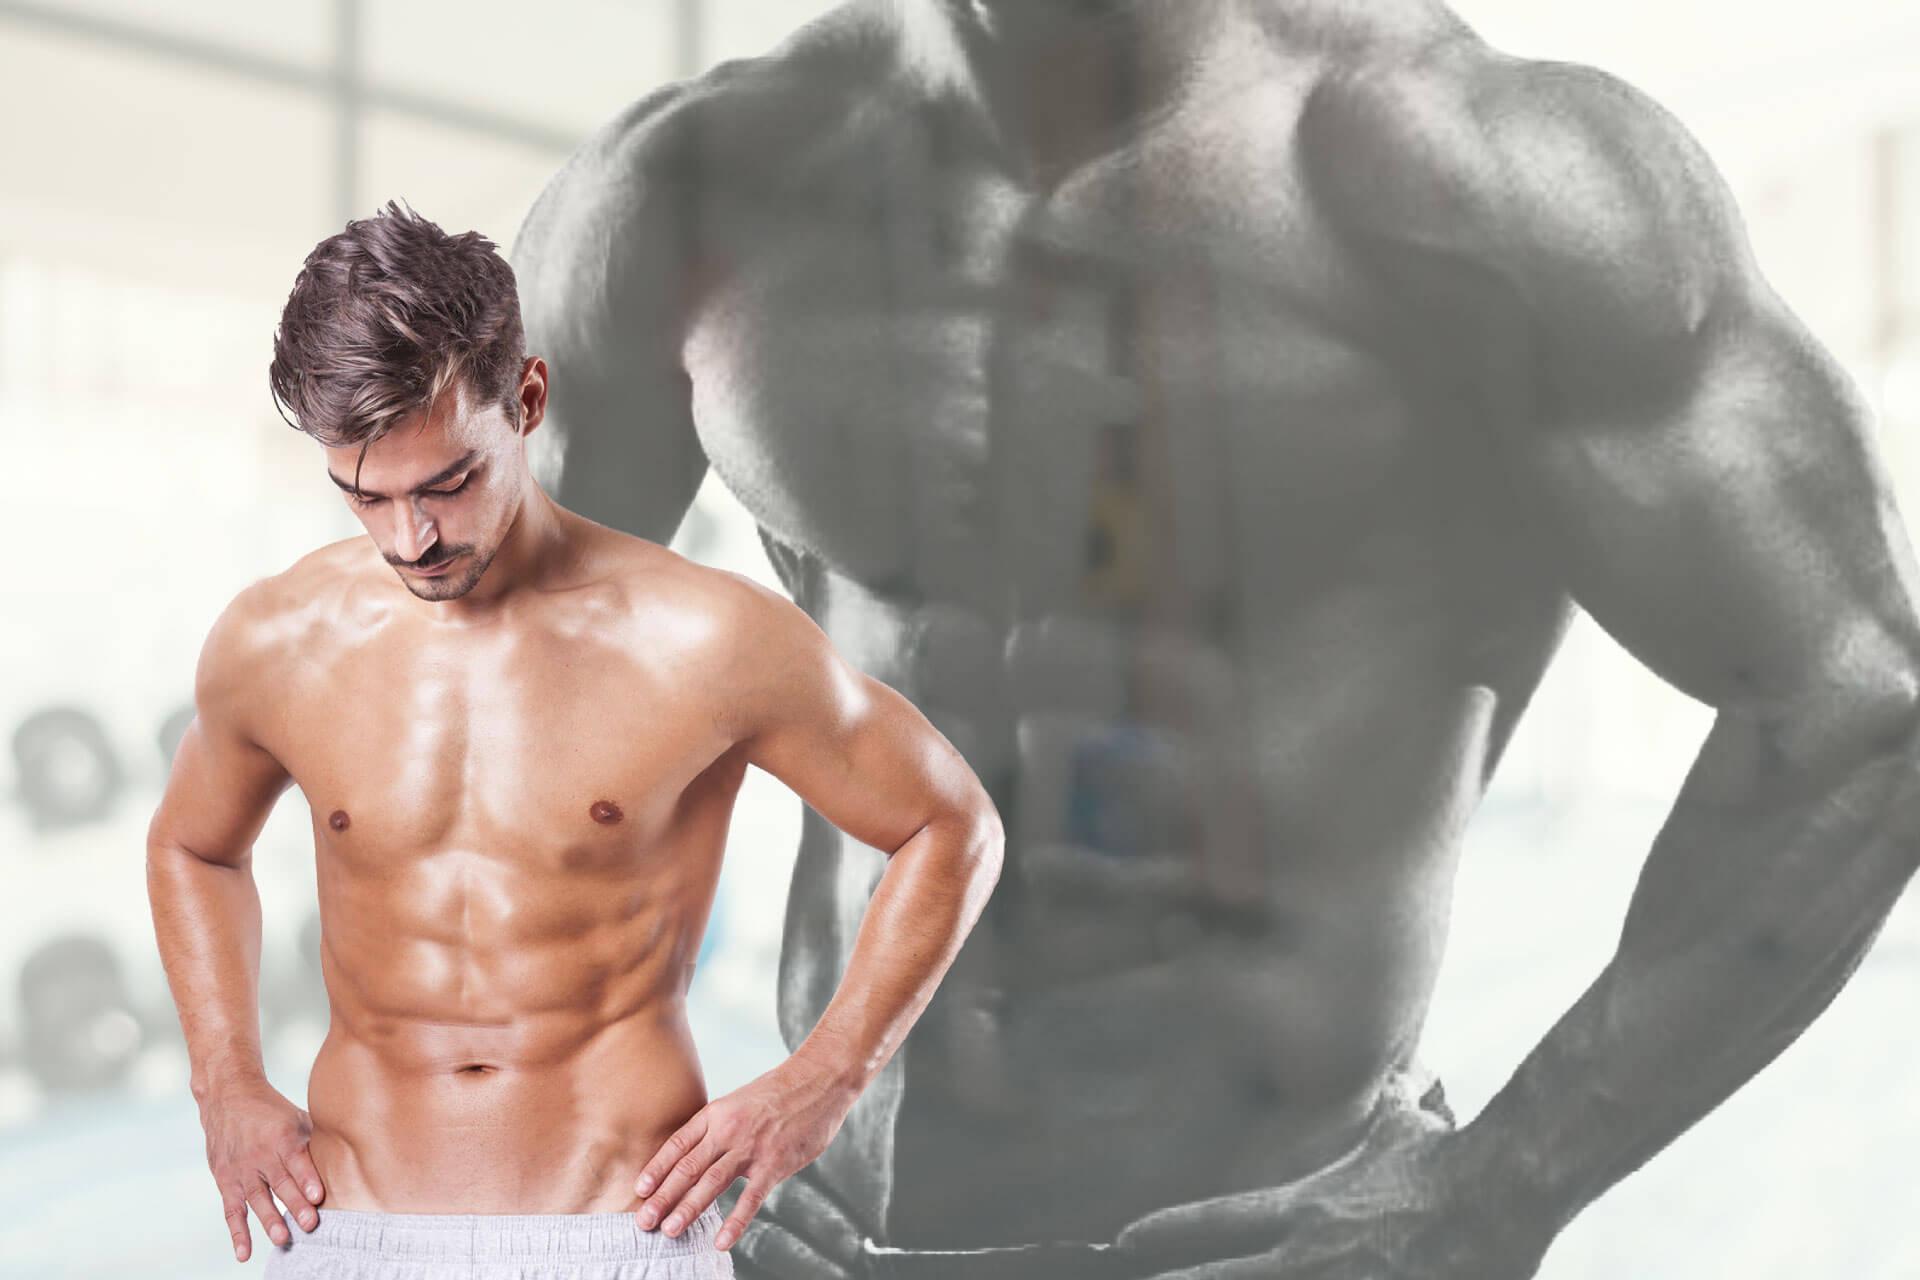 Skinny muscle, alica witt boobs